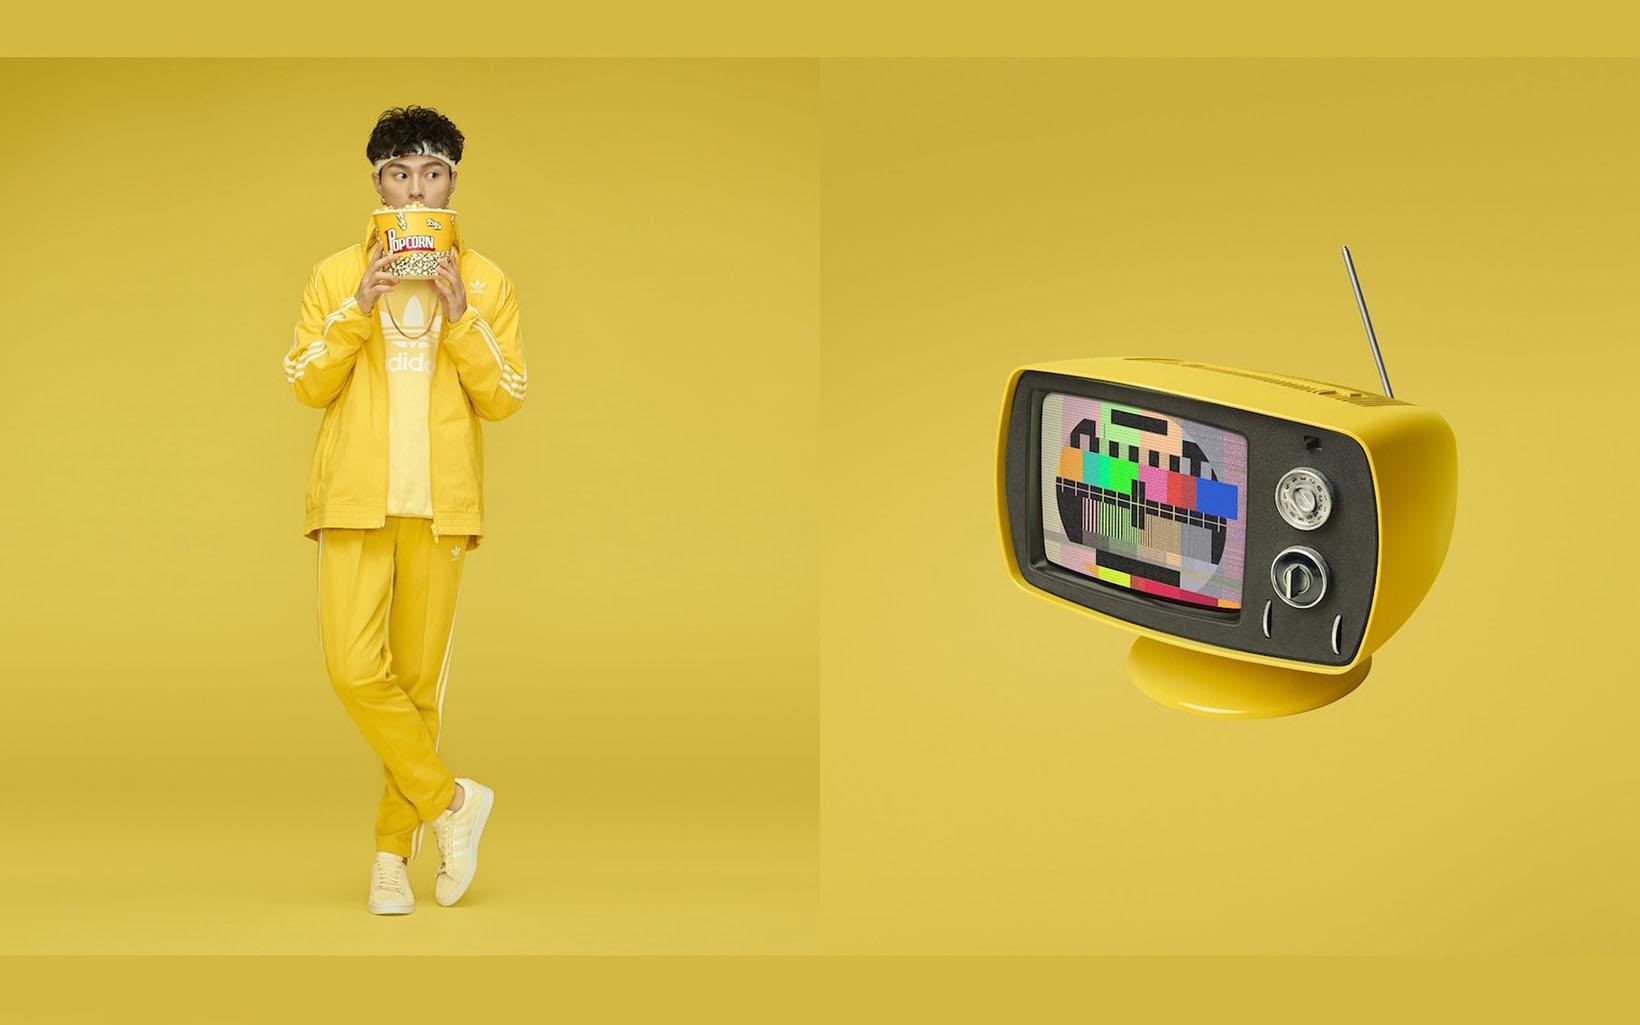 adidas-spring-summer-2018-adicolor-series-collection-9